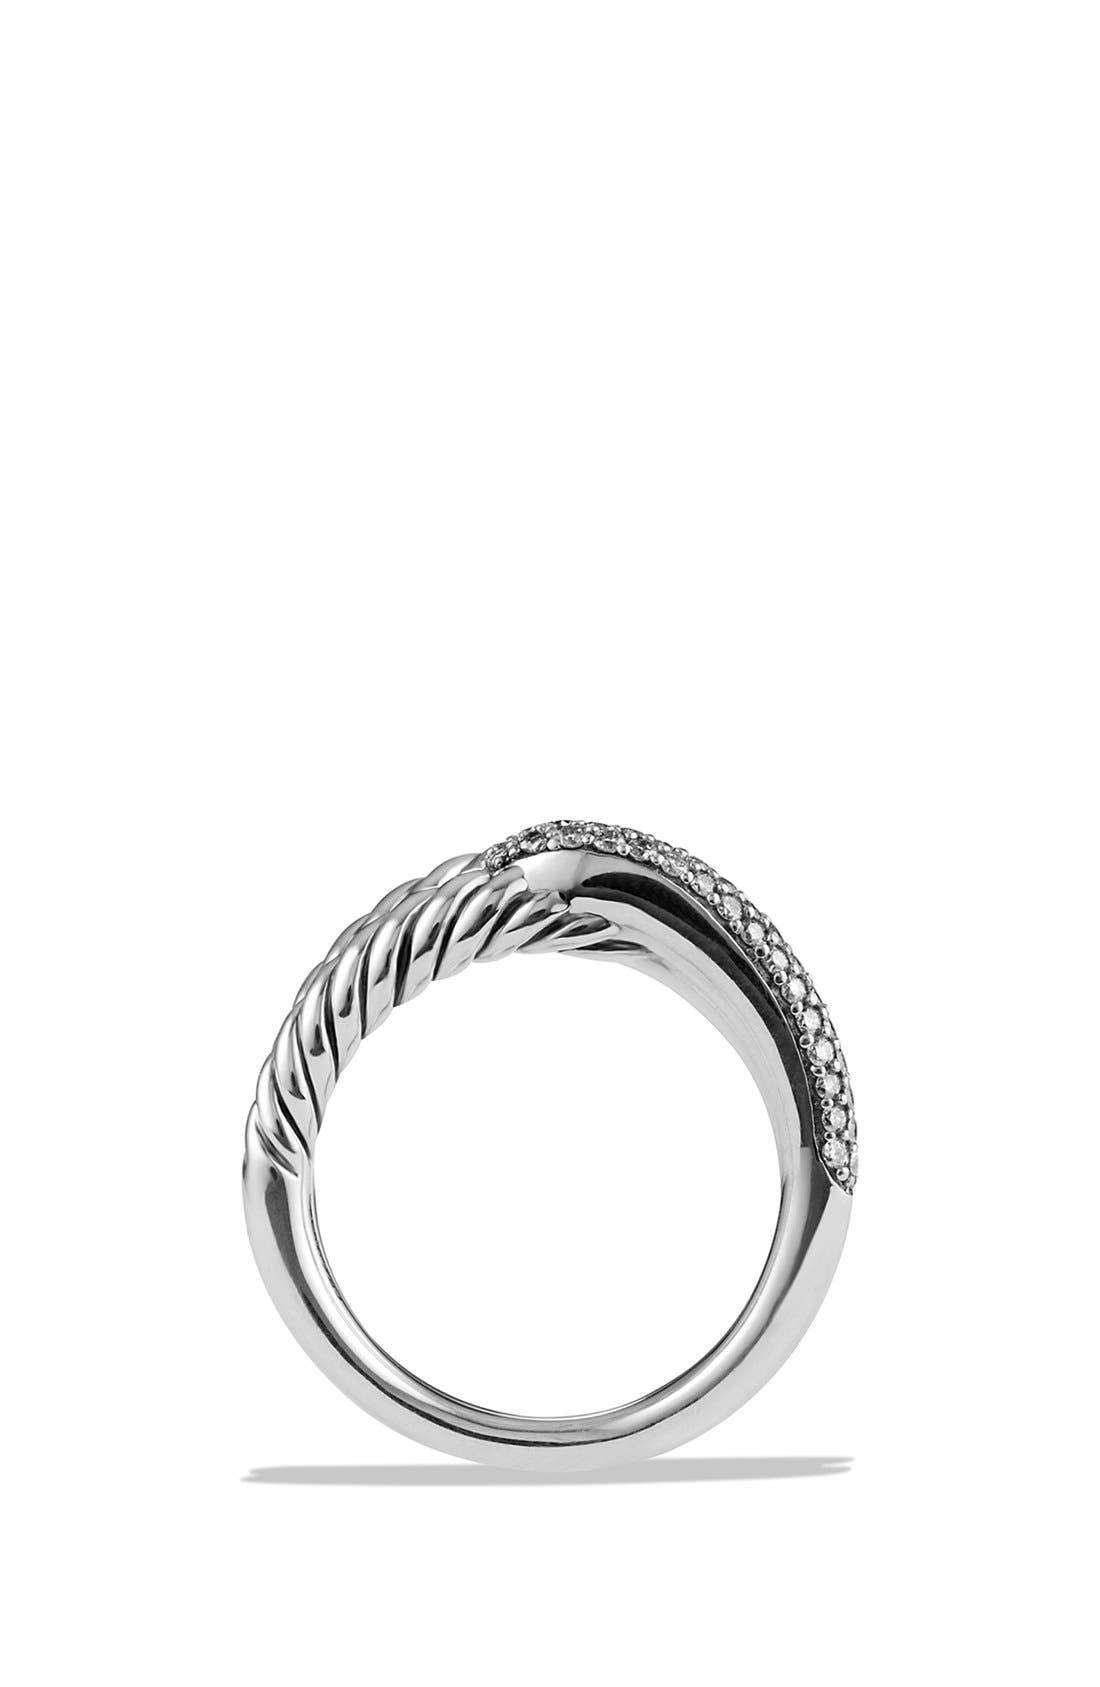 'Labyrinth' Single Loop Ring with Diamonds,                             Alternate thumbnail 3, color,                             Diamond